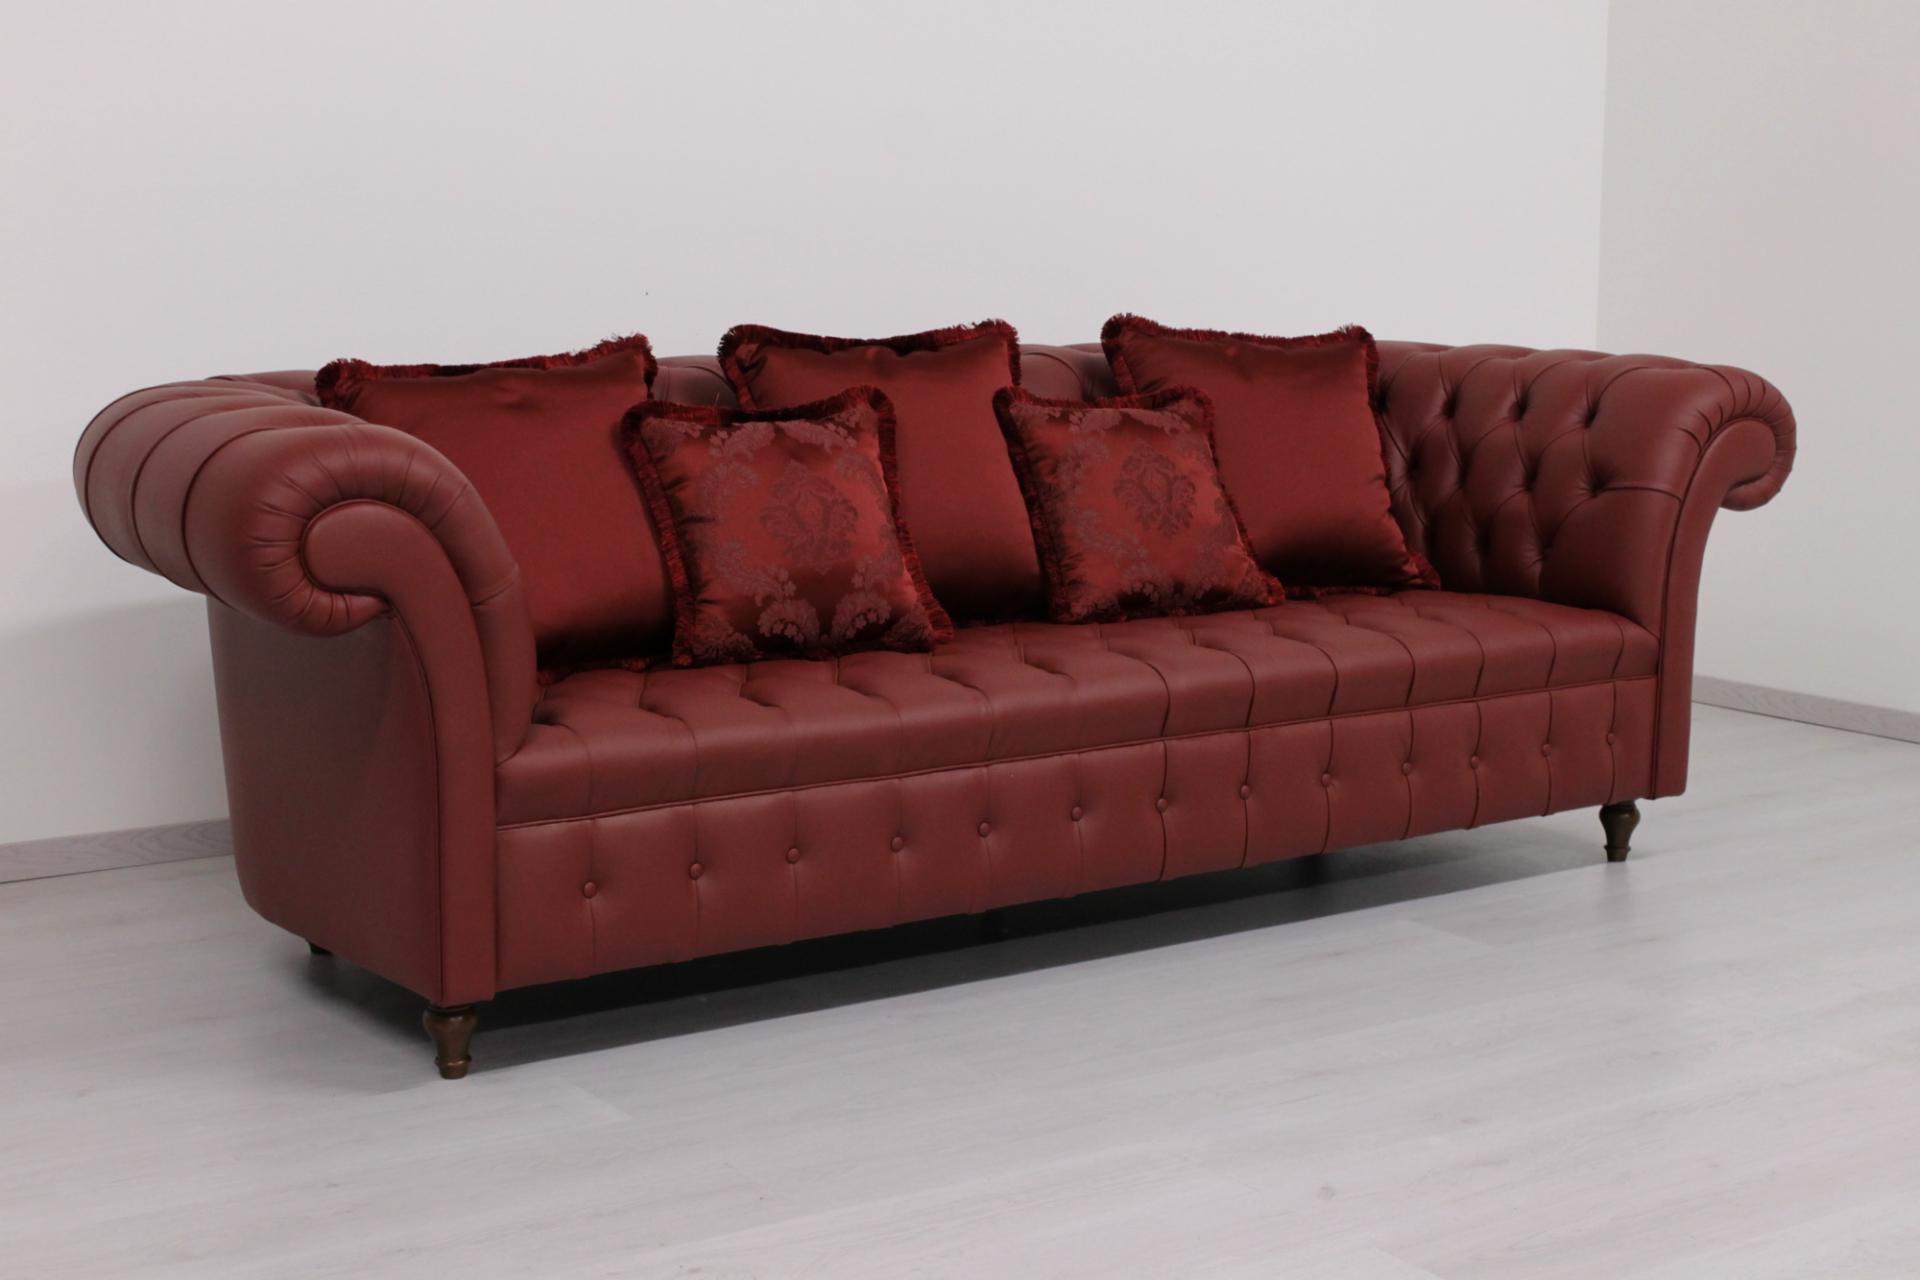 Living Room Swing Sofa Home Design Mannahatta us